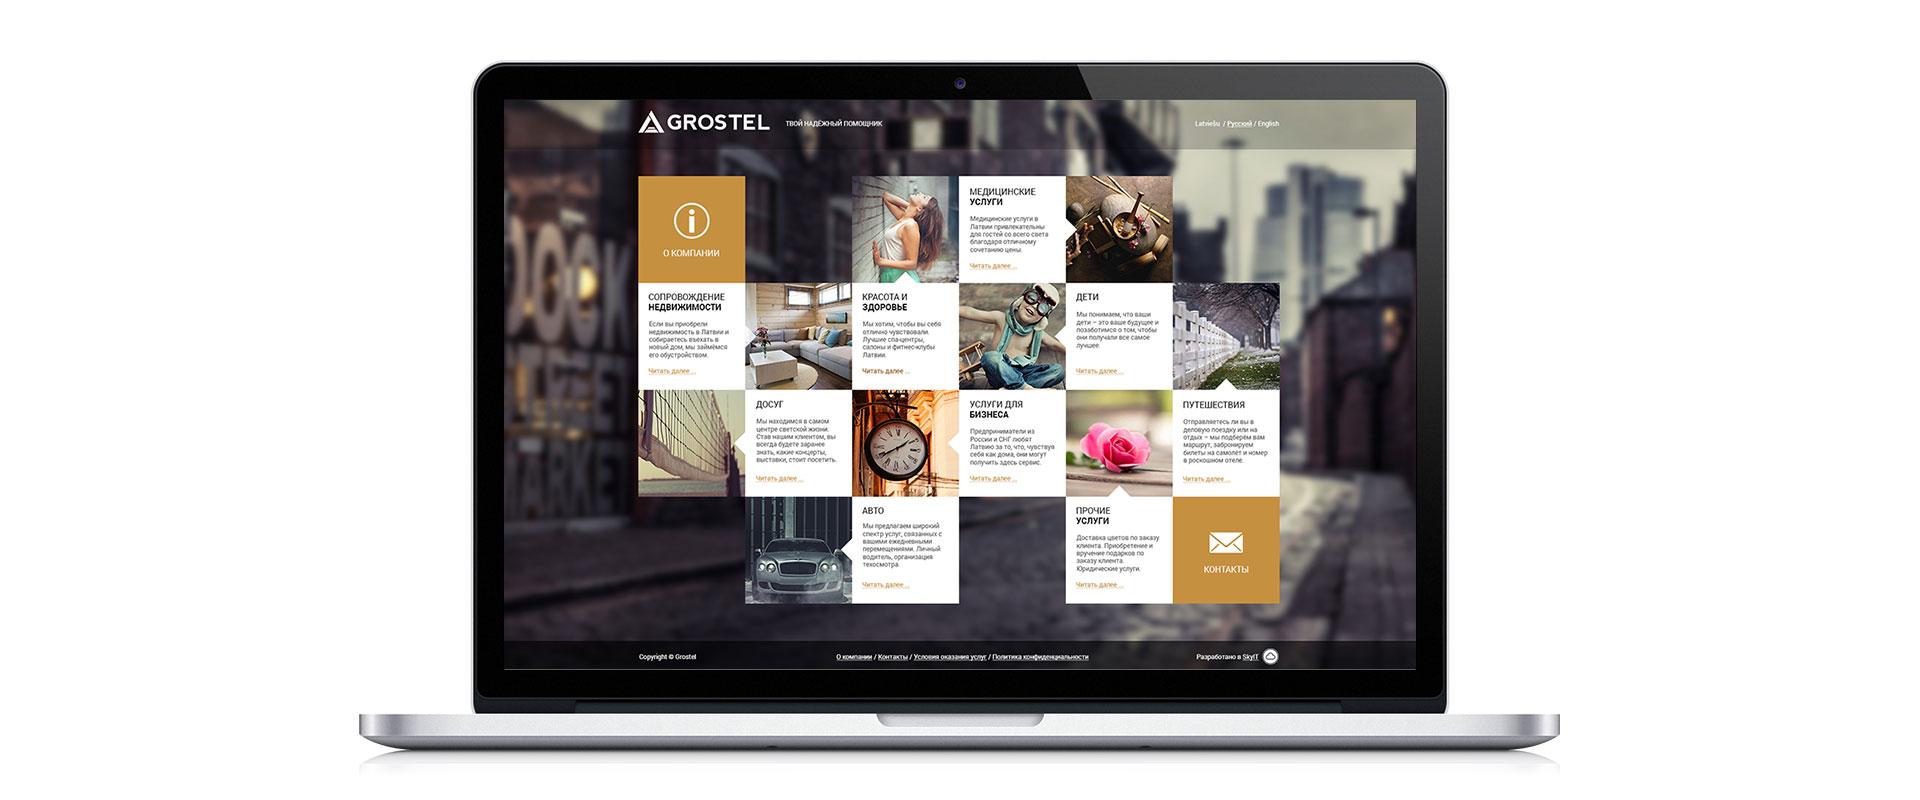 grostel-website-2